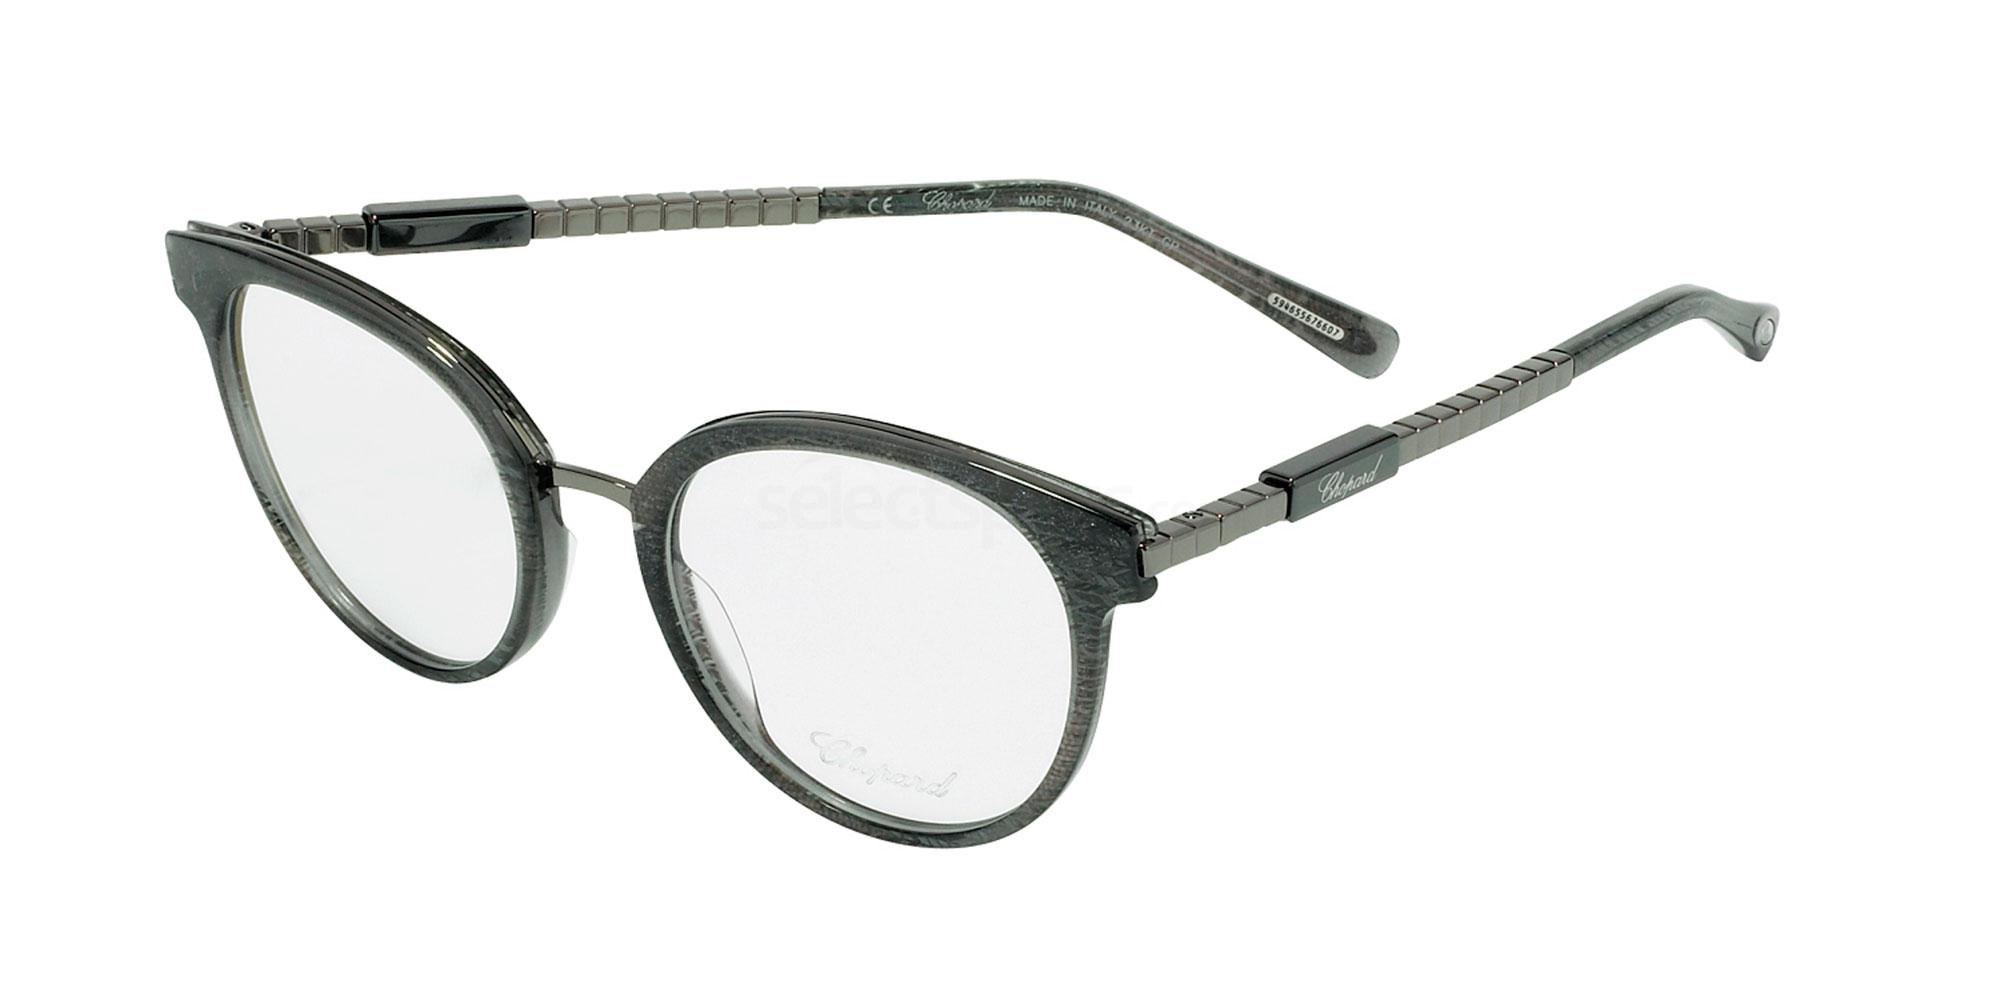 09E5 VCH239 Glasses, Chopard